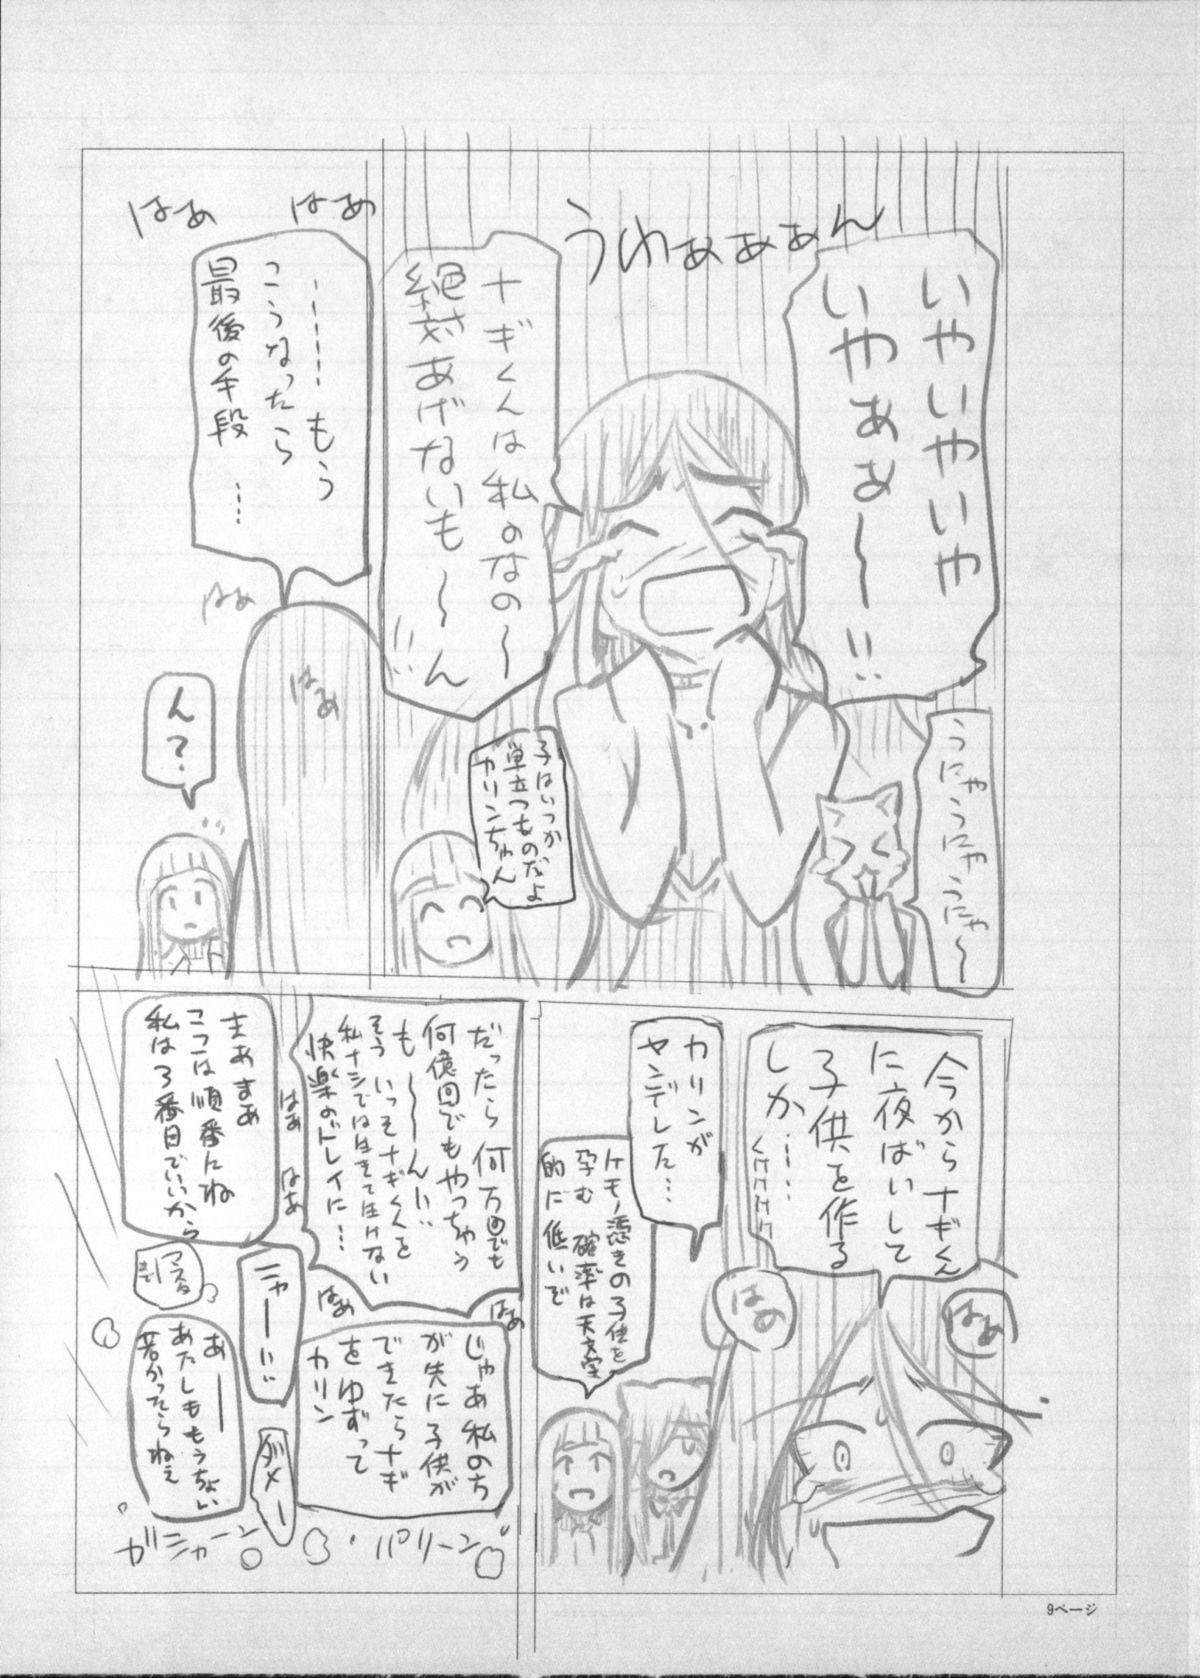 Majo × Shota ~ Genteiban | 魔女X小正太 限定版 264